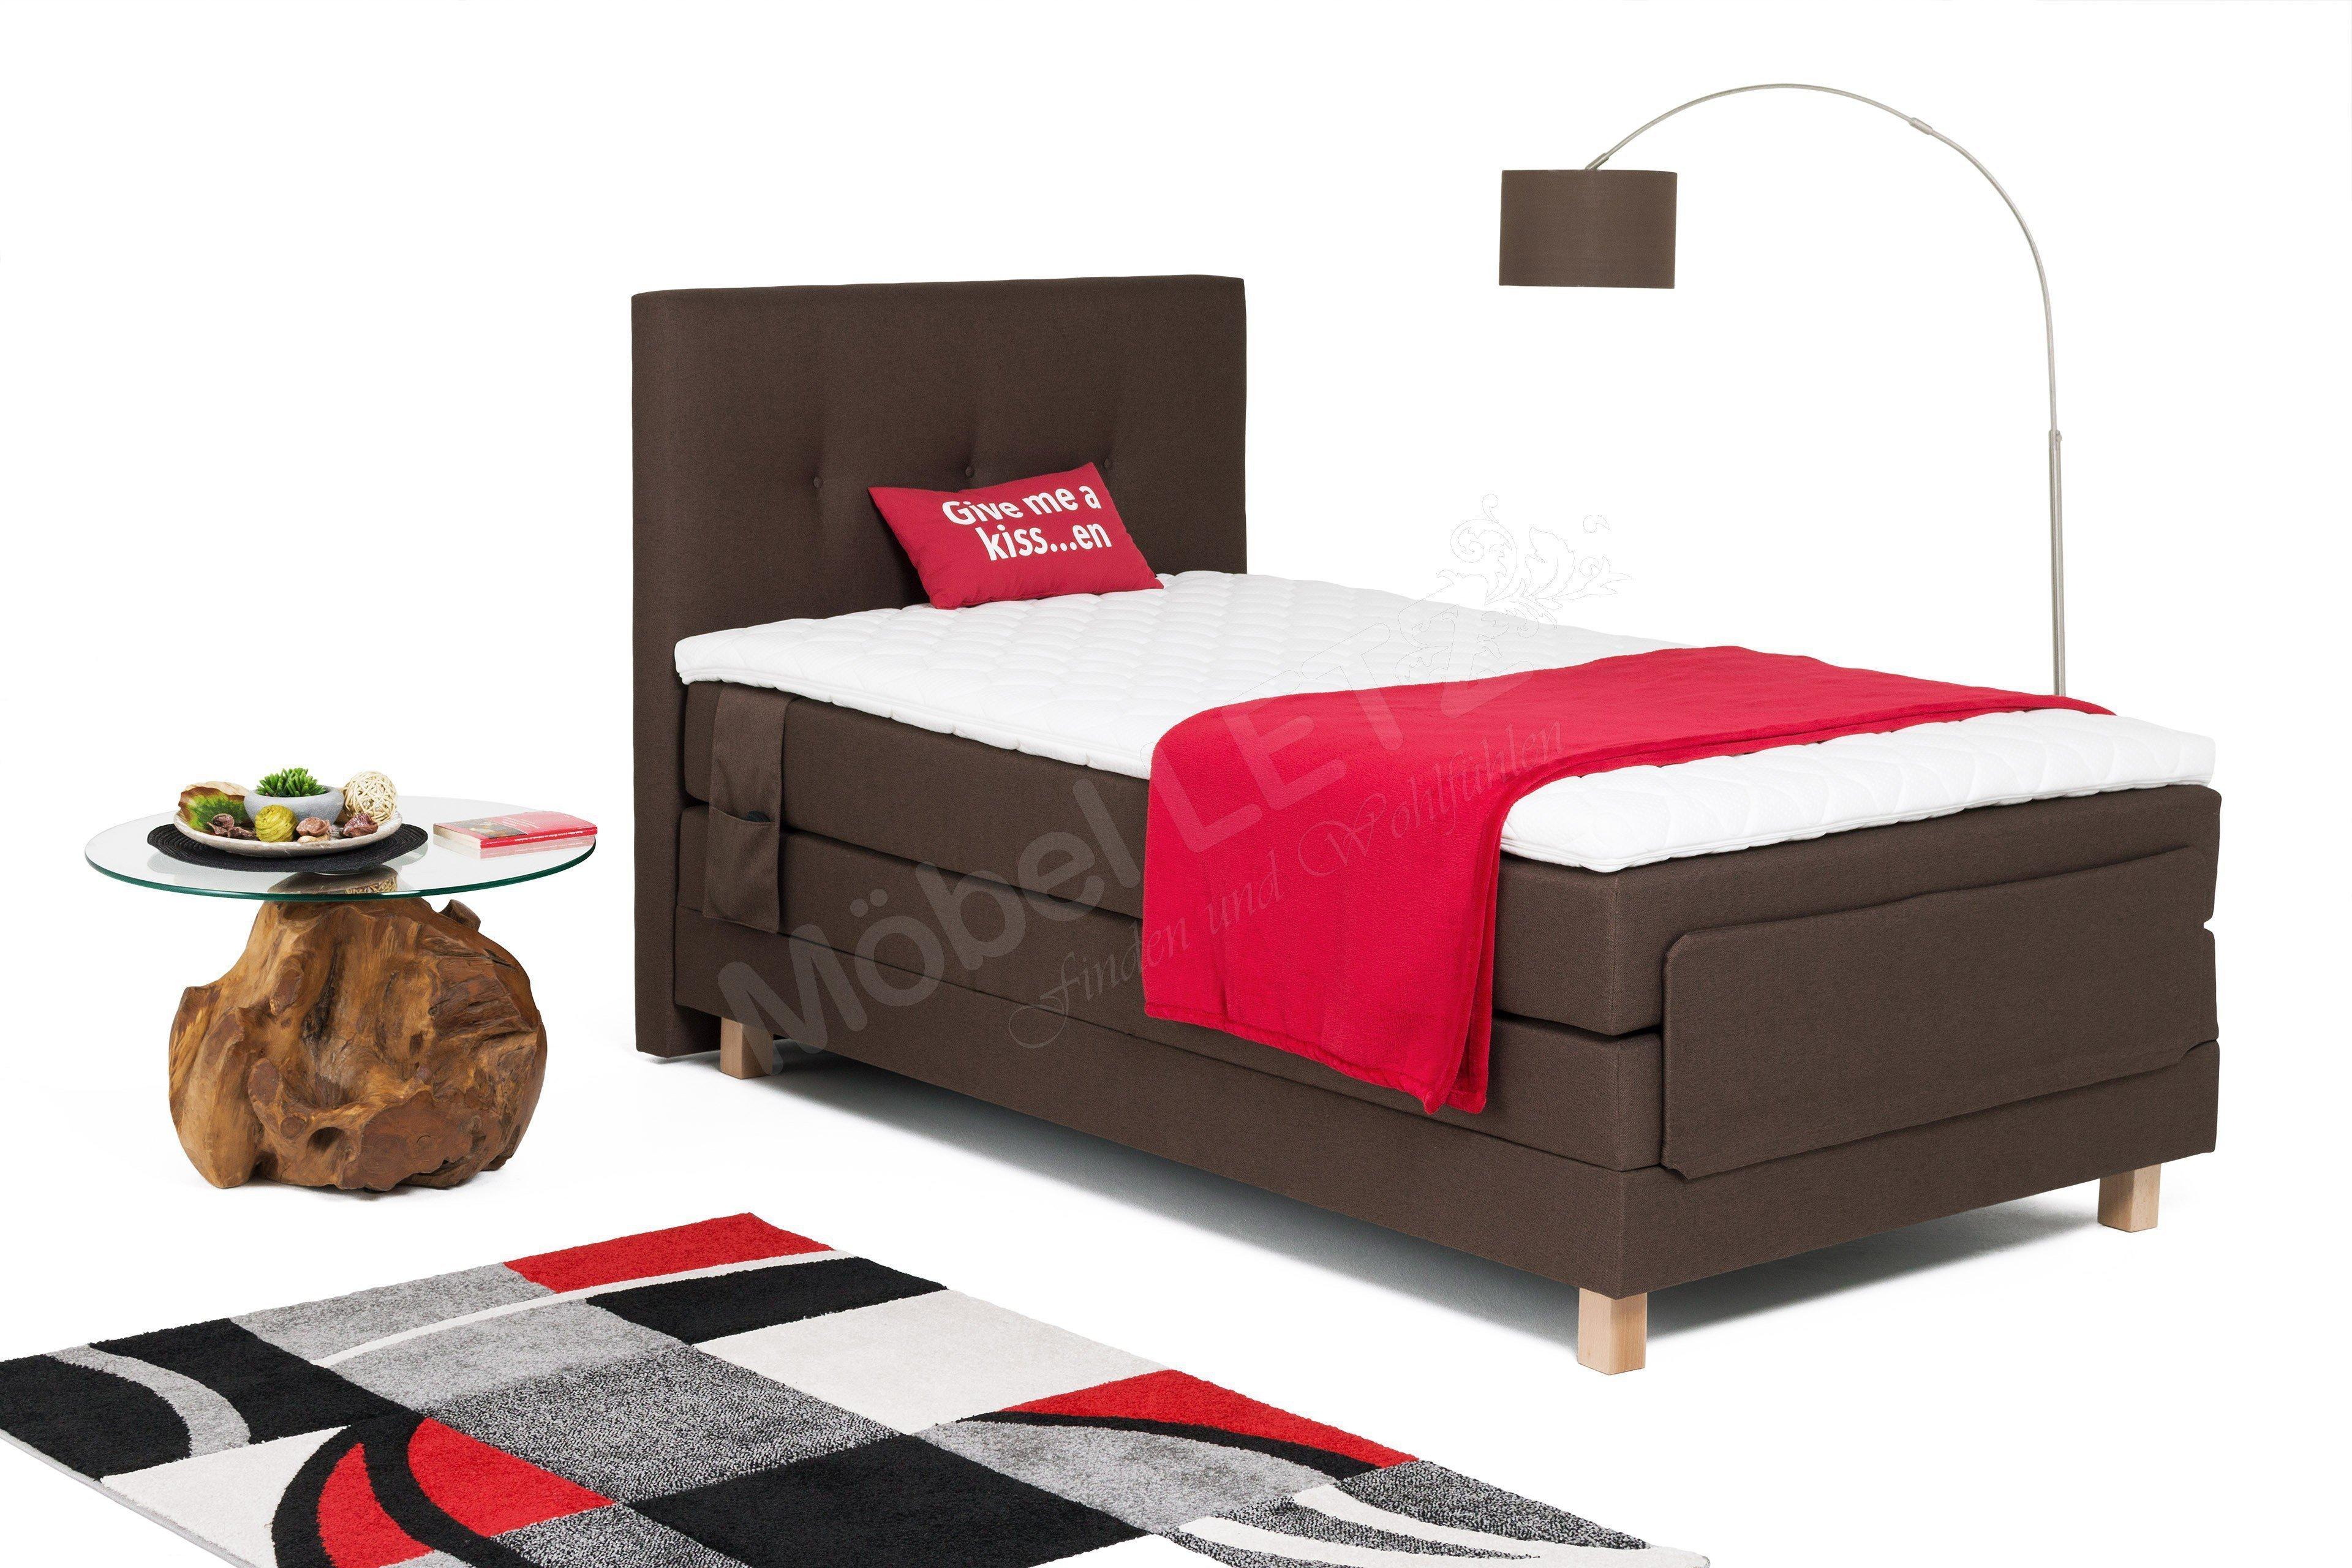 skandinavische m bel boxspringbett jensen mit motor m bel letz ihr online shop. Black Bedroom Furniture Sets. Home Design Ideas